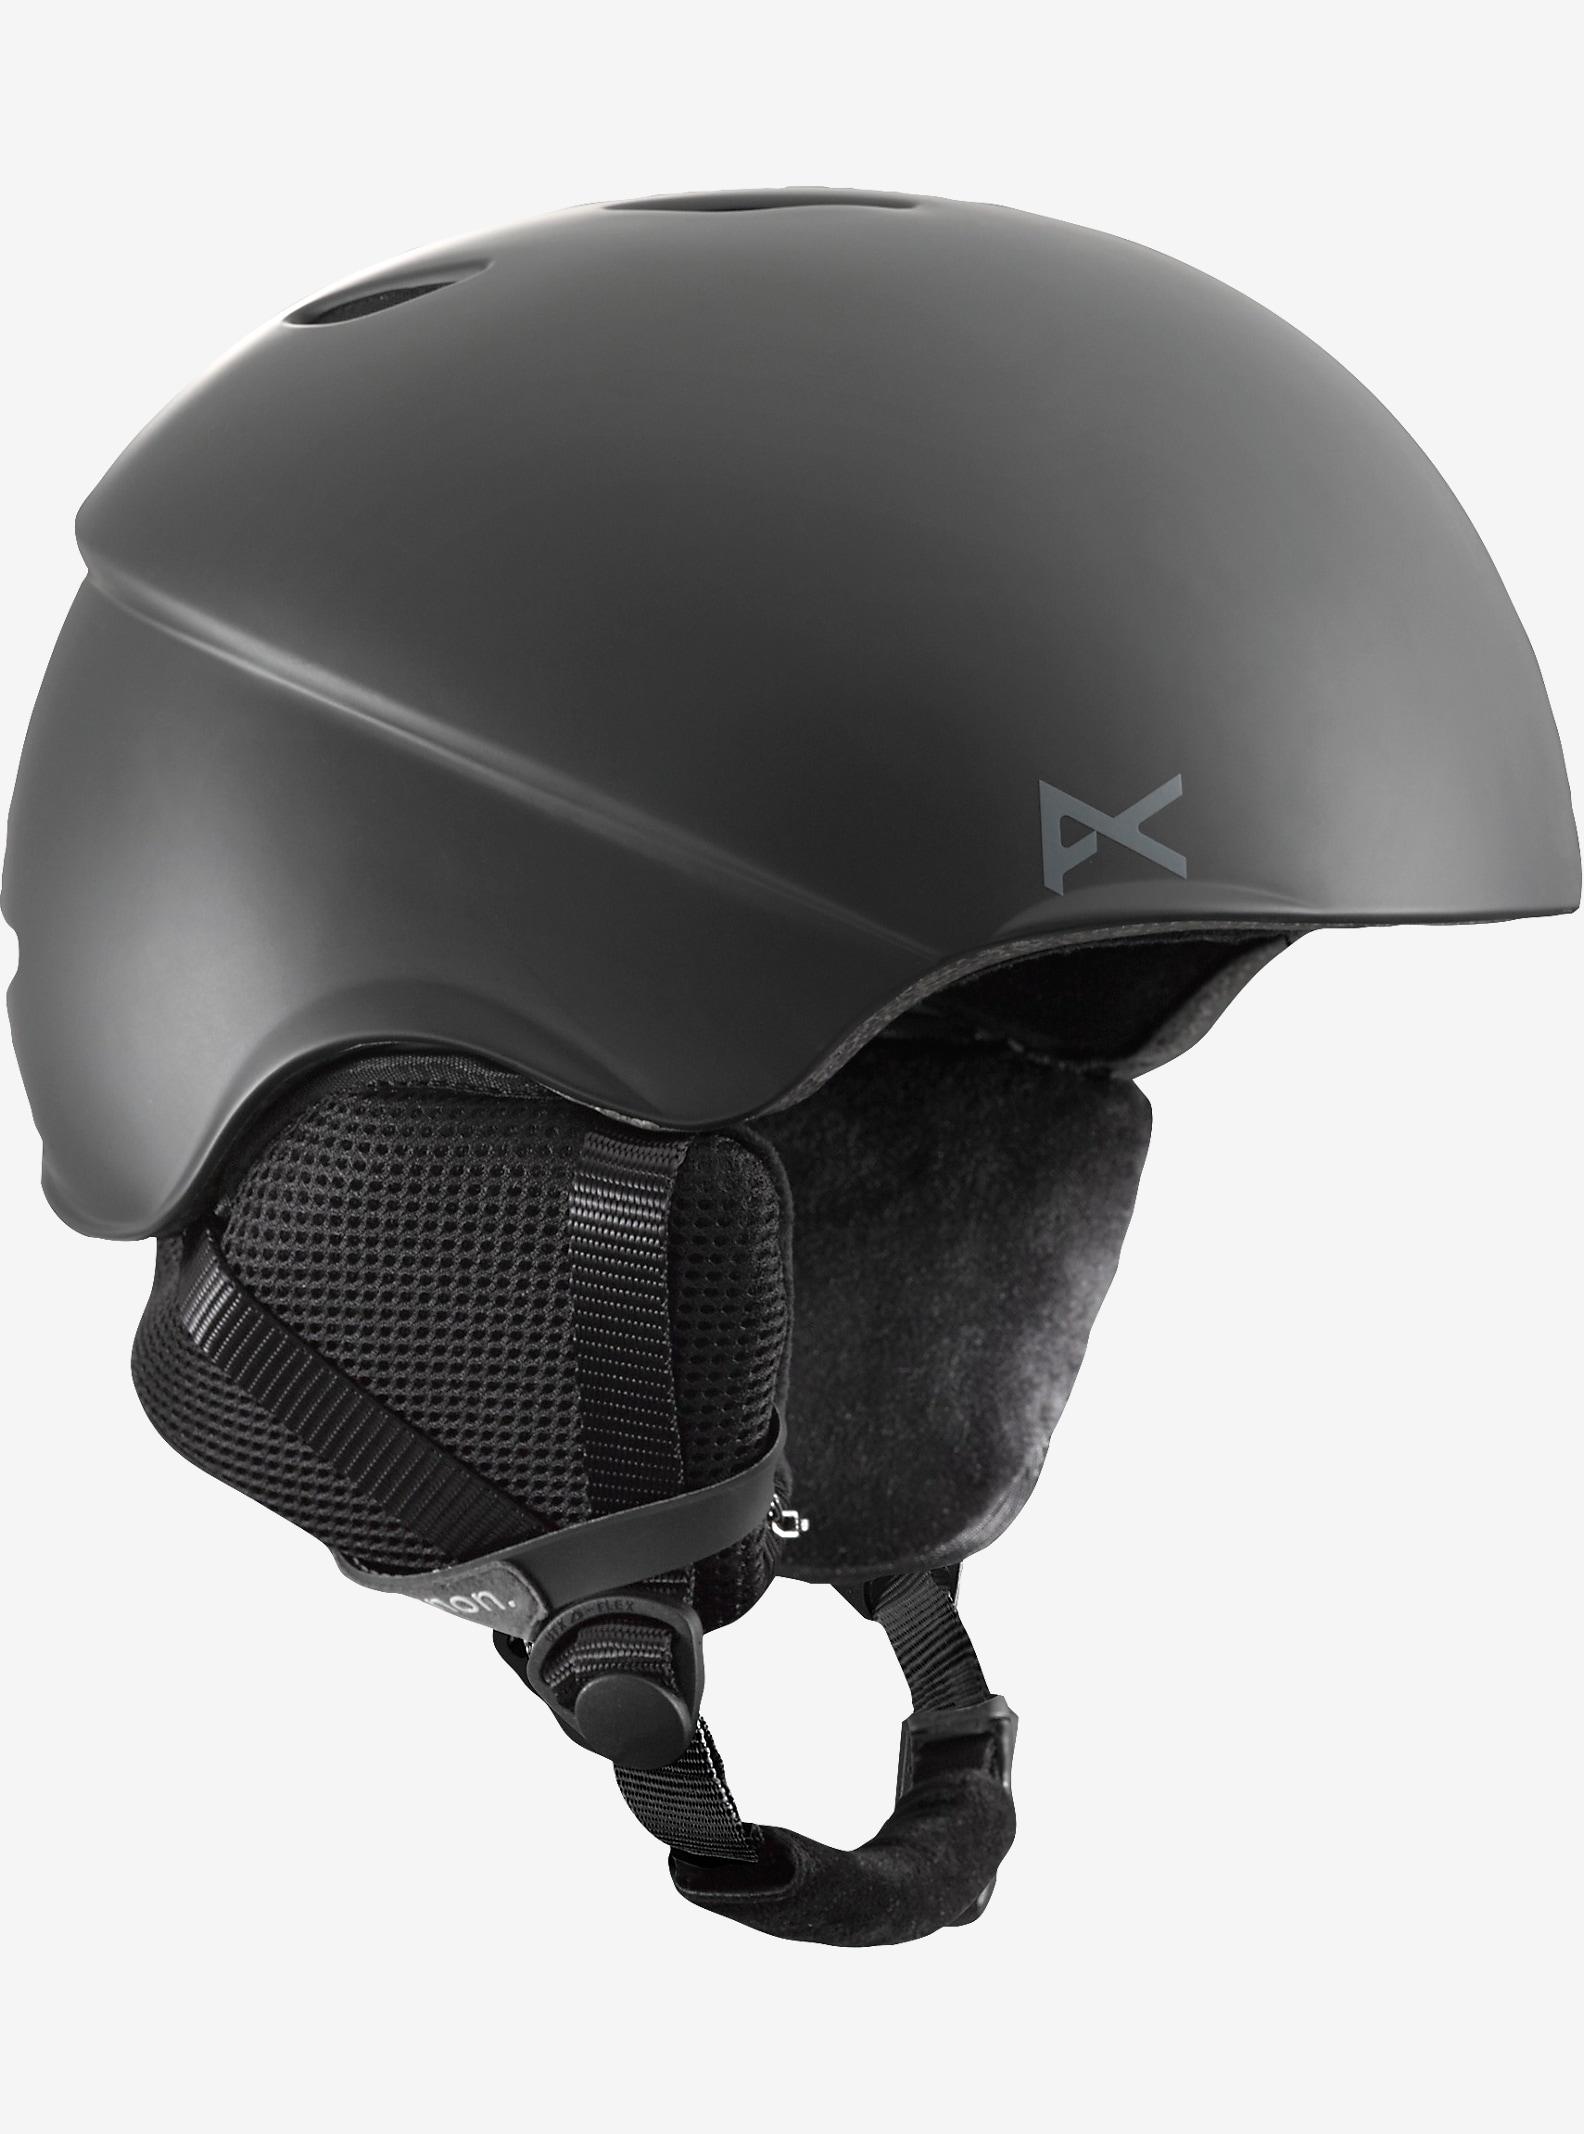 anon. Helo Helmet shown in Black Asia